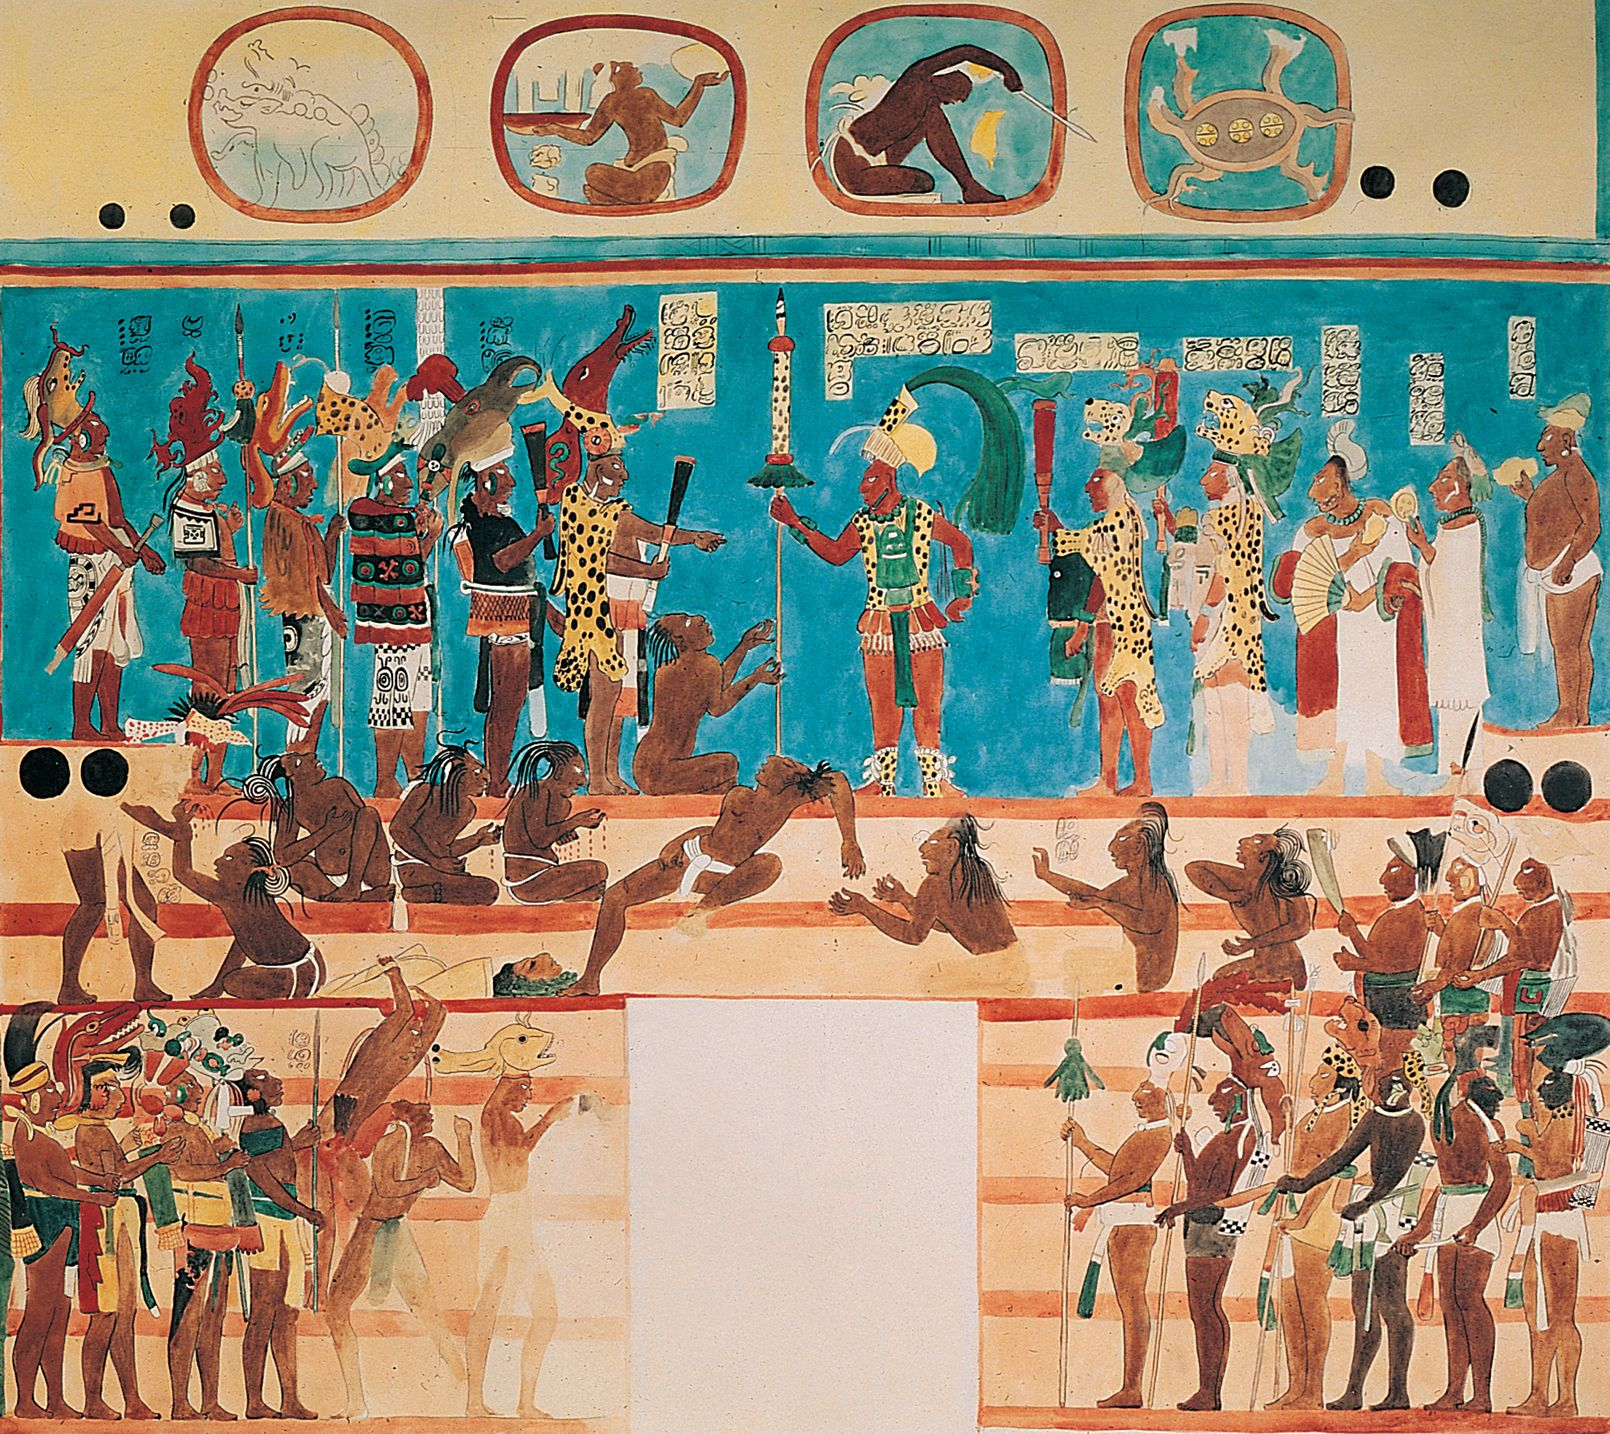 Los mayas mesoamerican paintings and art art for Bonampak mural painting